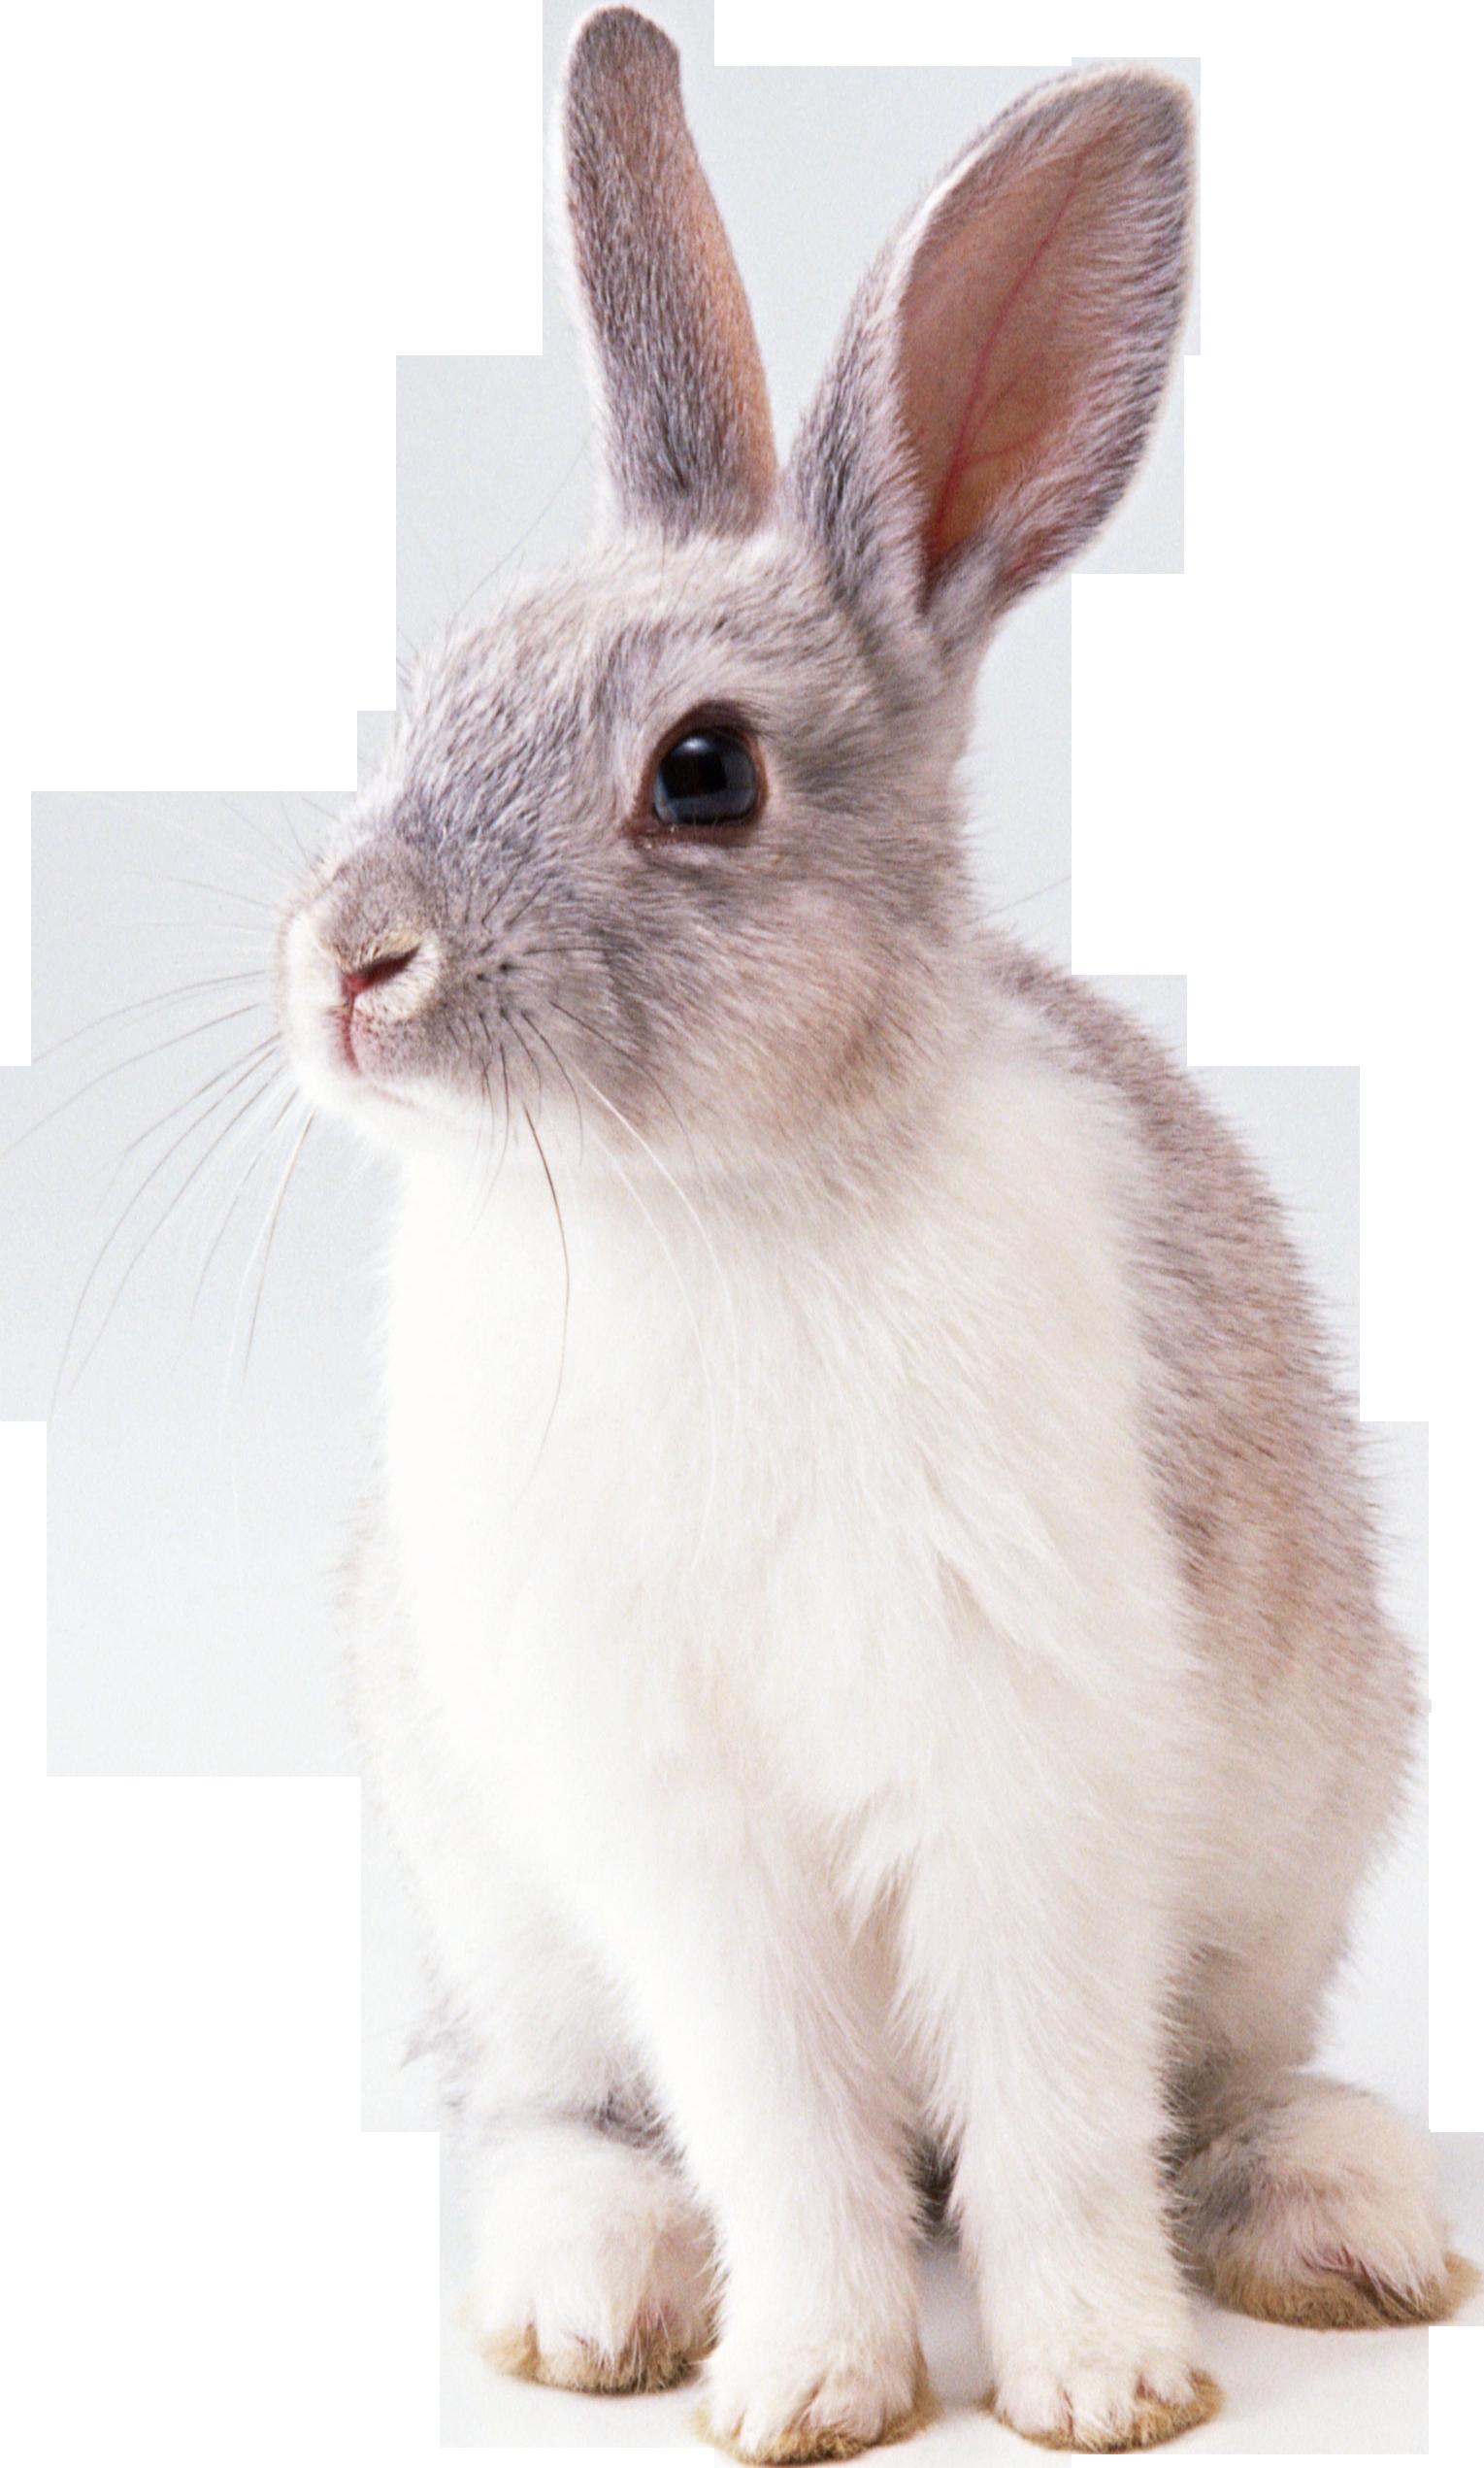 White Rabbit PNG Image - Rabbit HD PNG